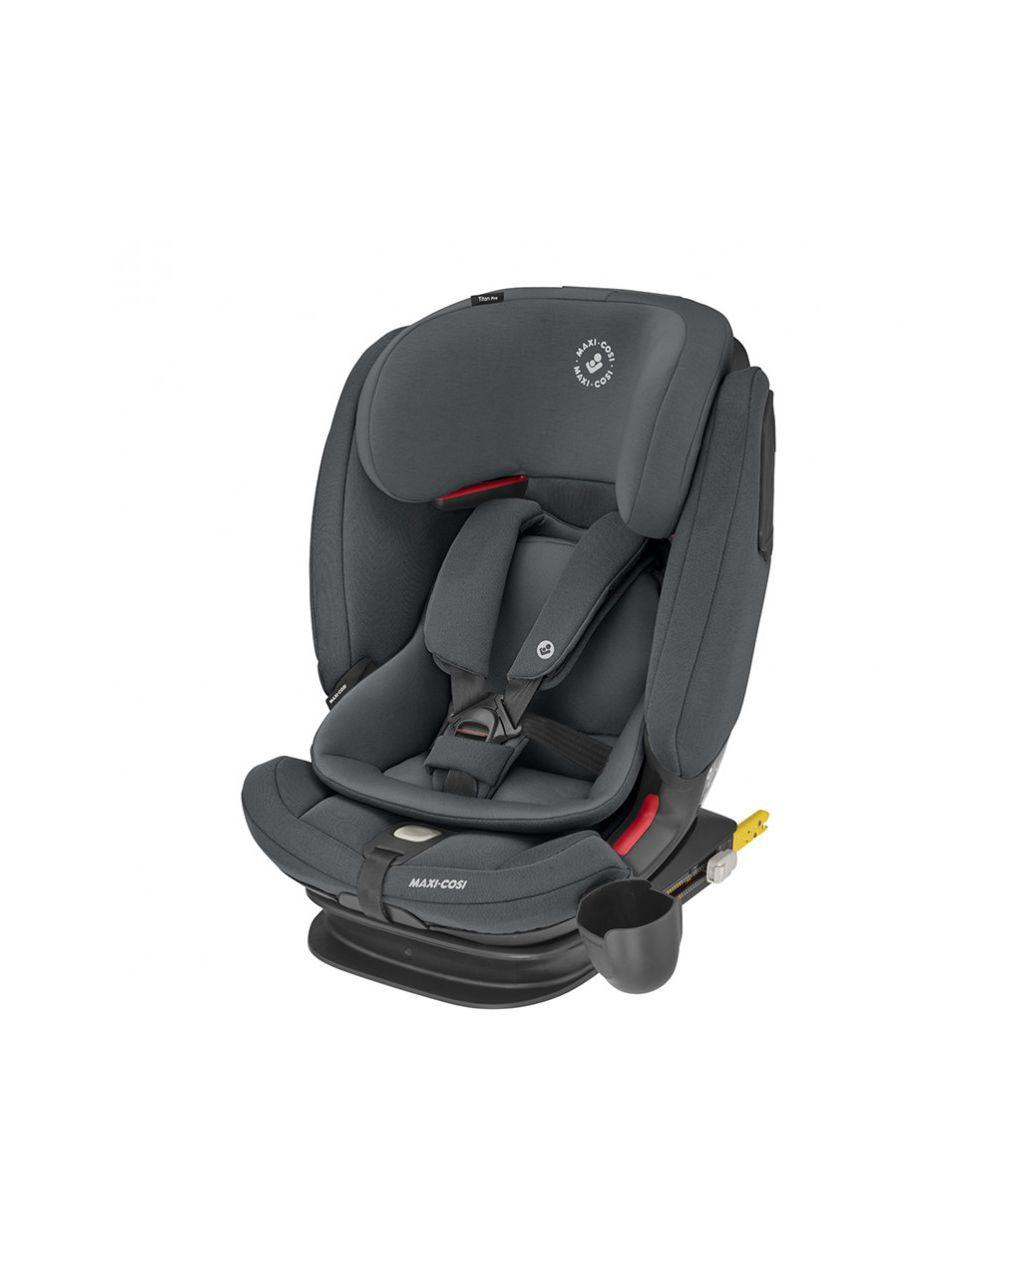 Maxi-Cosi Κάθισμα αυτοκινήτου Titan Pro Authentic Graphite Ομ.1-2-3